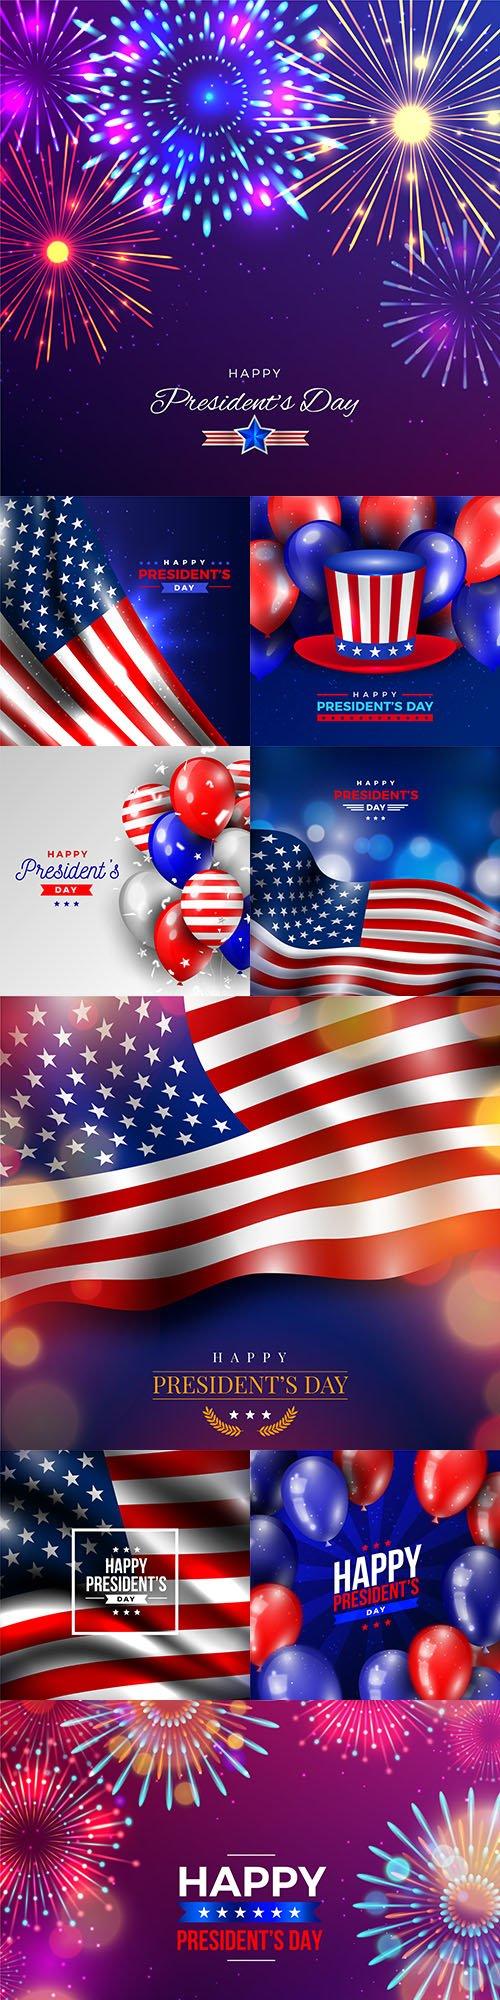 Happy President Day decorative illustrations 3